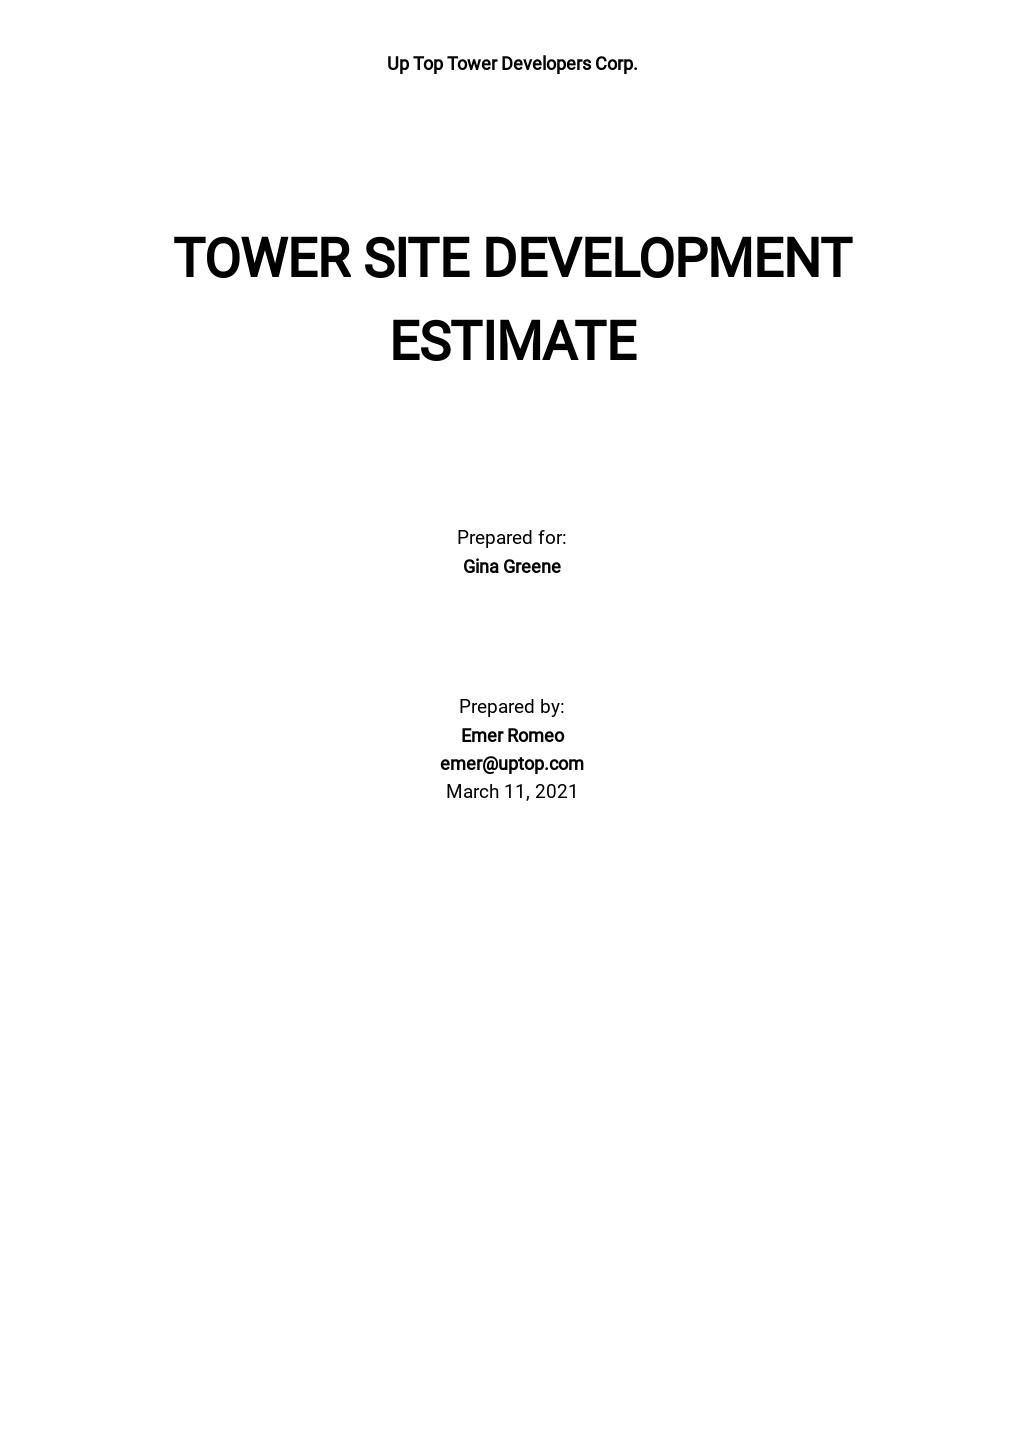 Development Estimate Template